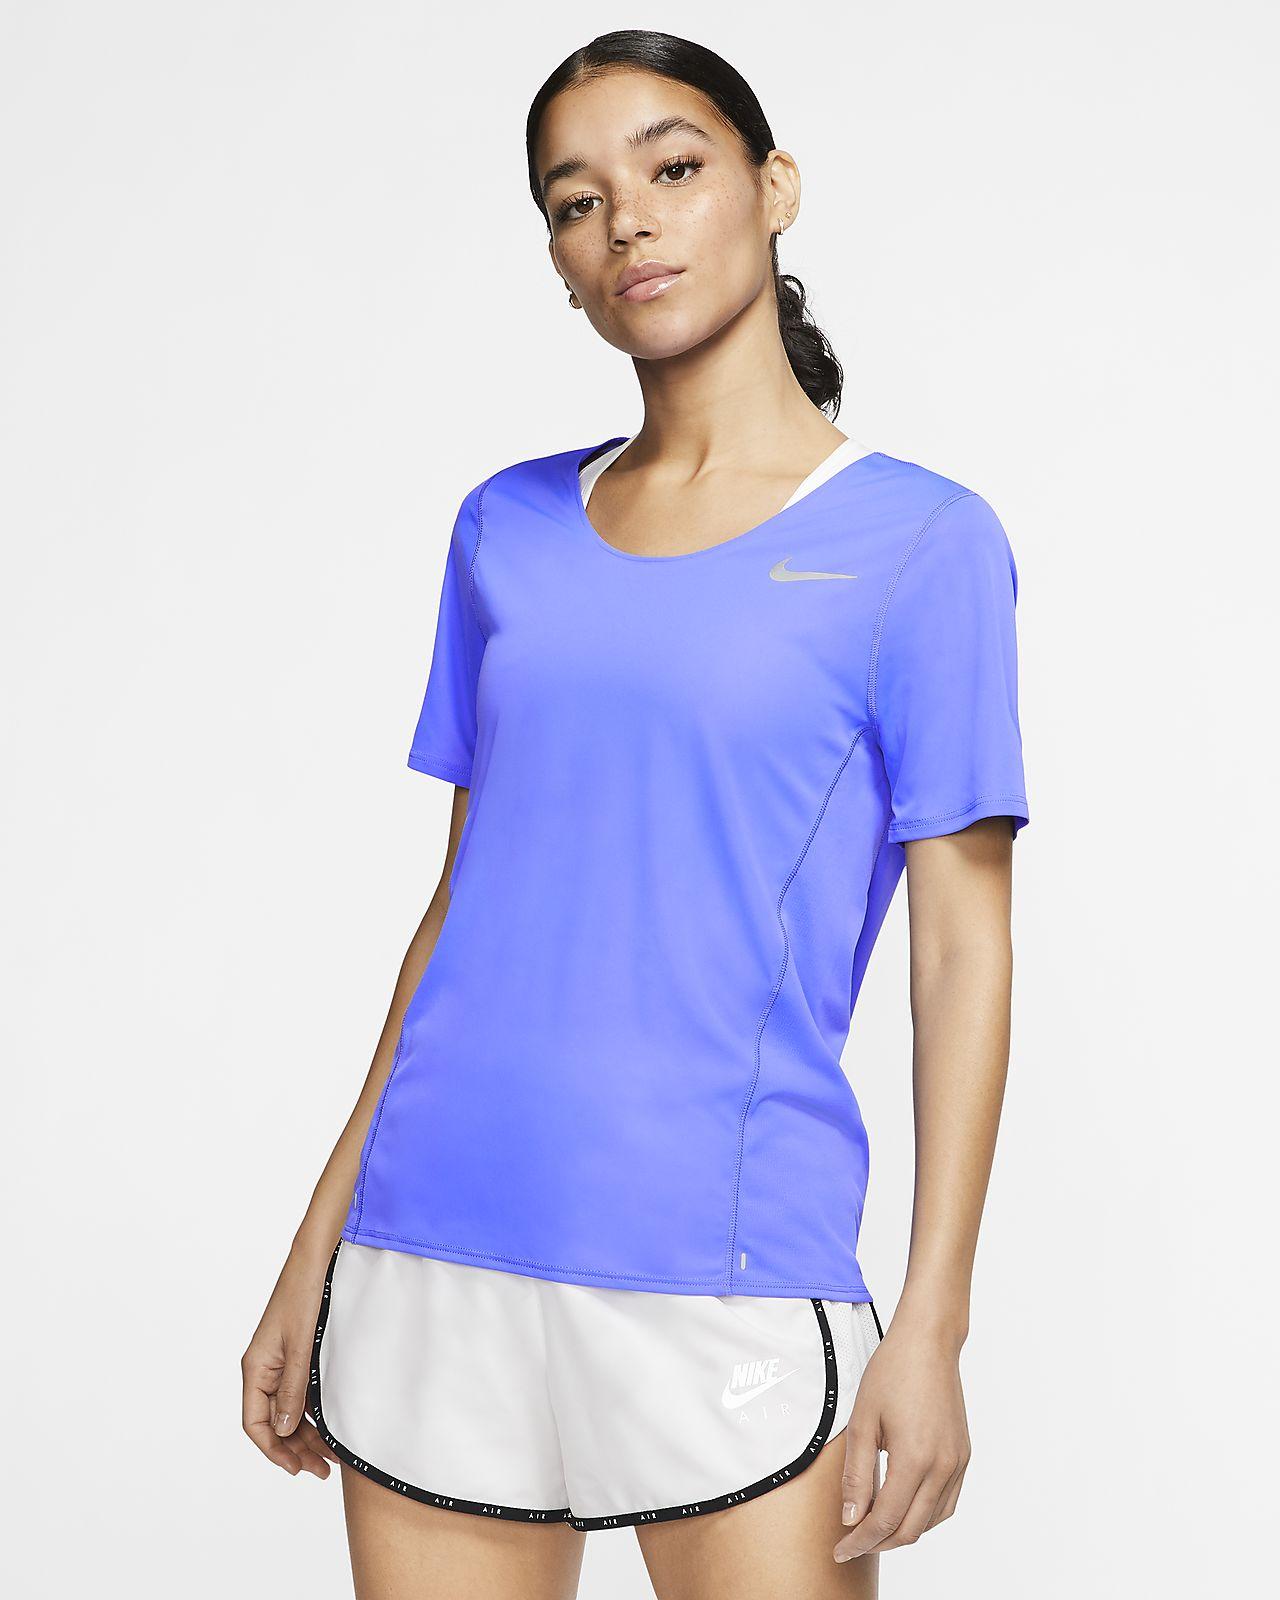 Nike City Sleek Women's Short Sleeve Running Top